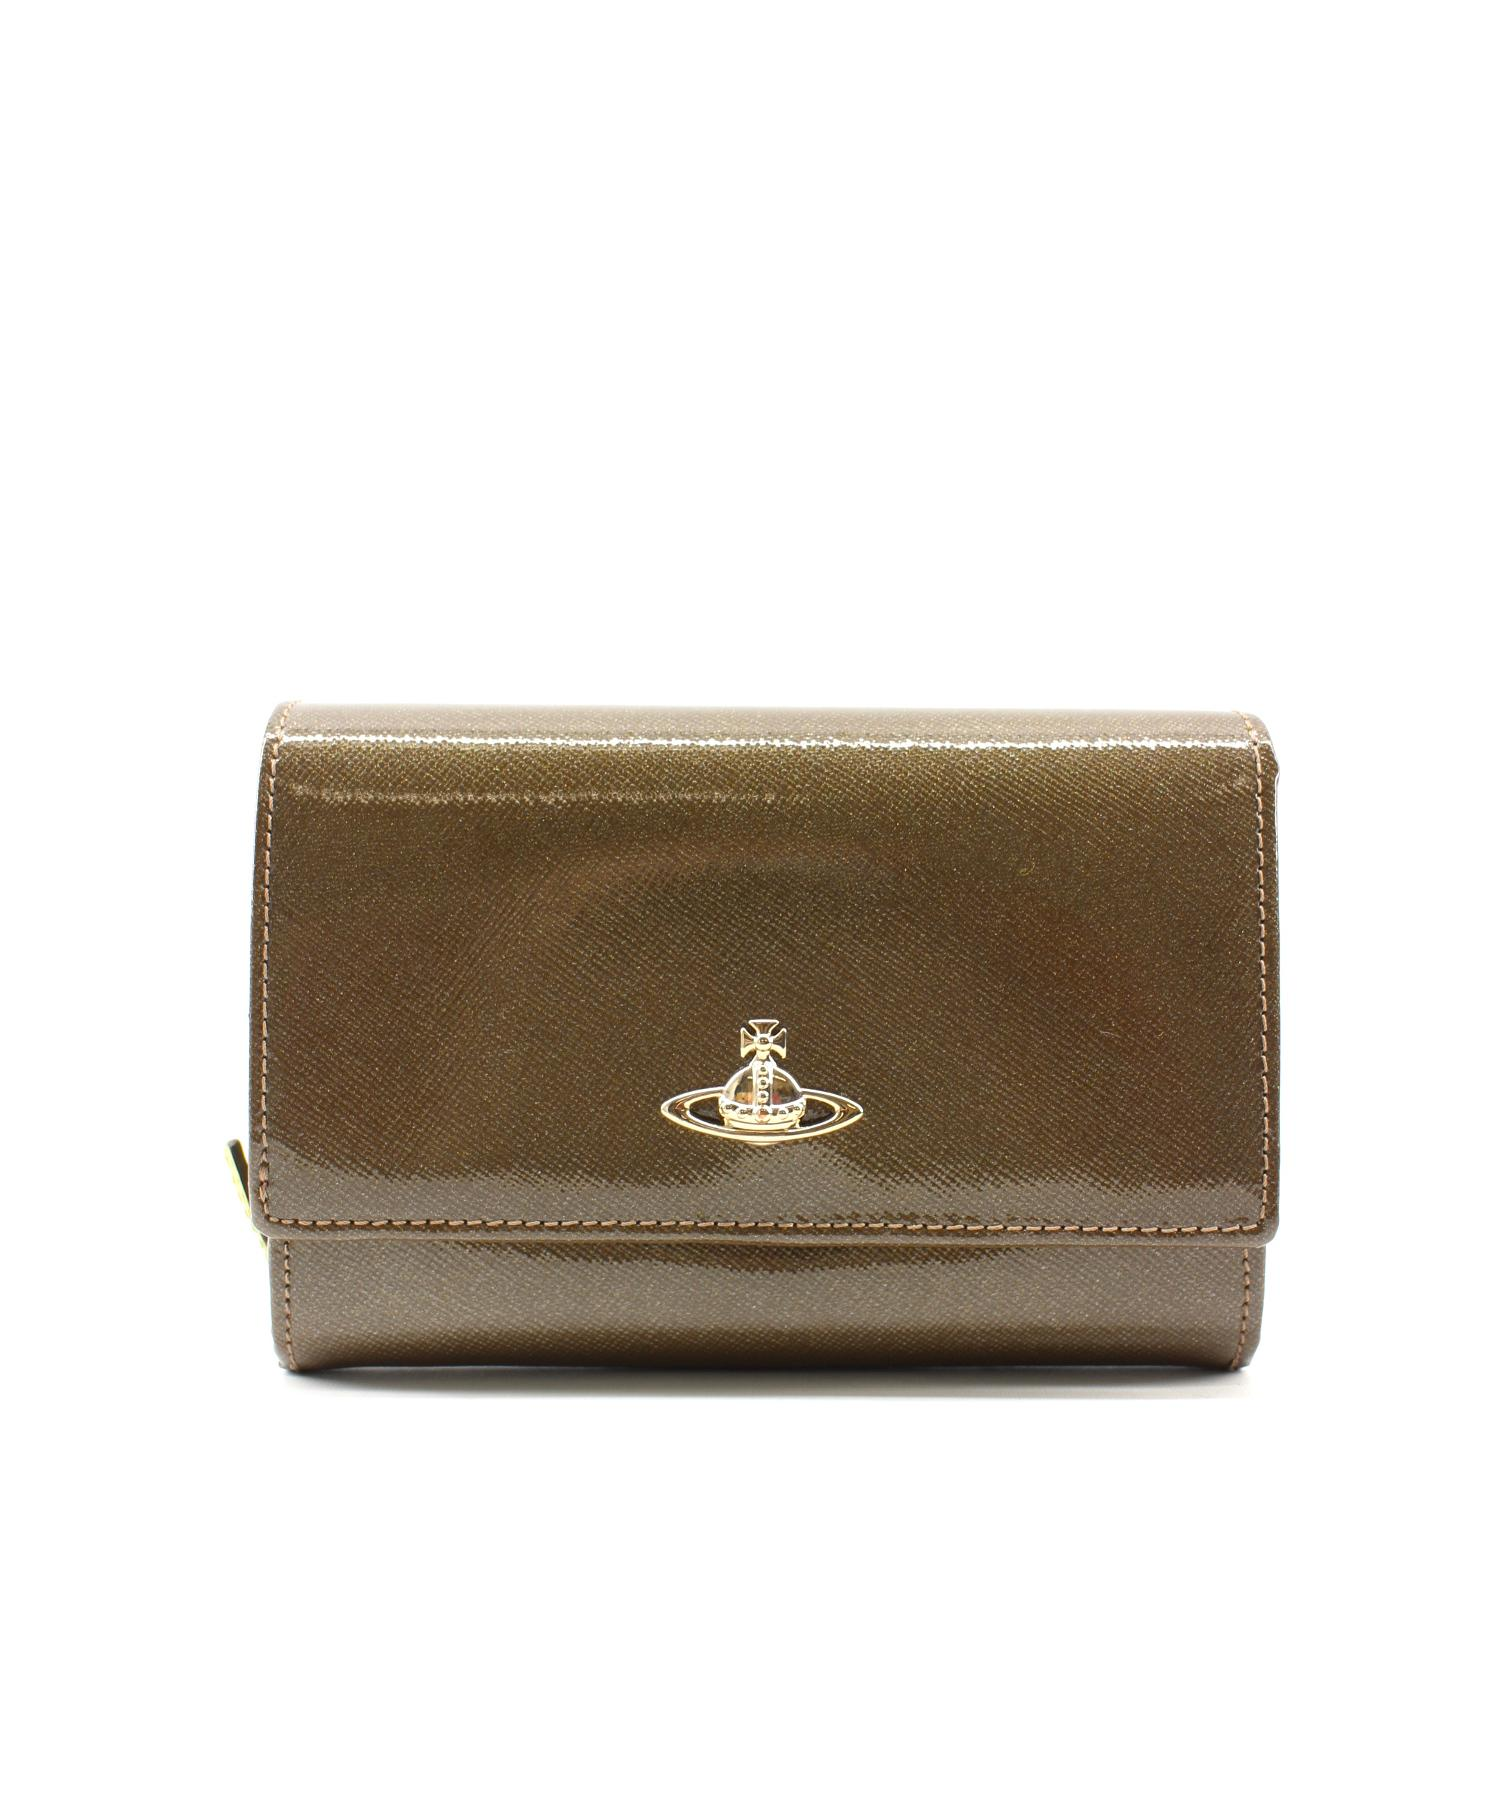 ce80c117954f Vivienne Westwood (ヴィヴィアンウエストウッド) 3つ折り財布 サイズ:下記参照 イタリア製. Vivienne Westwood